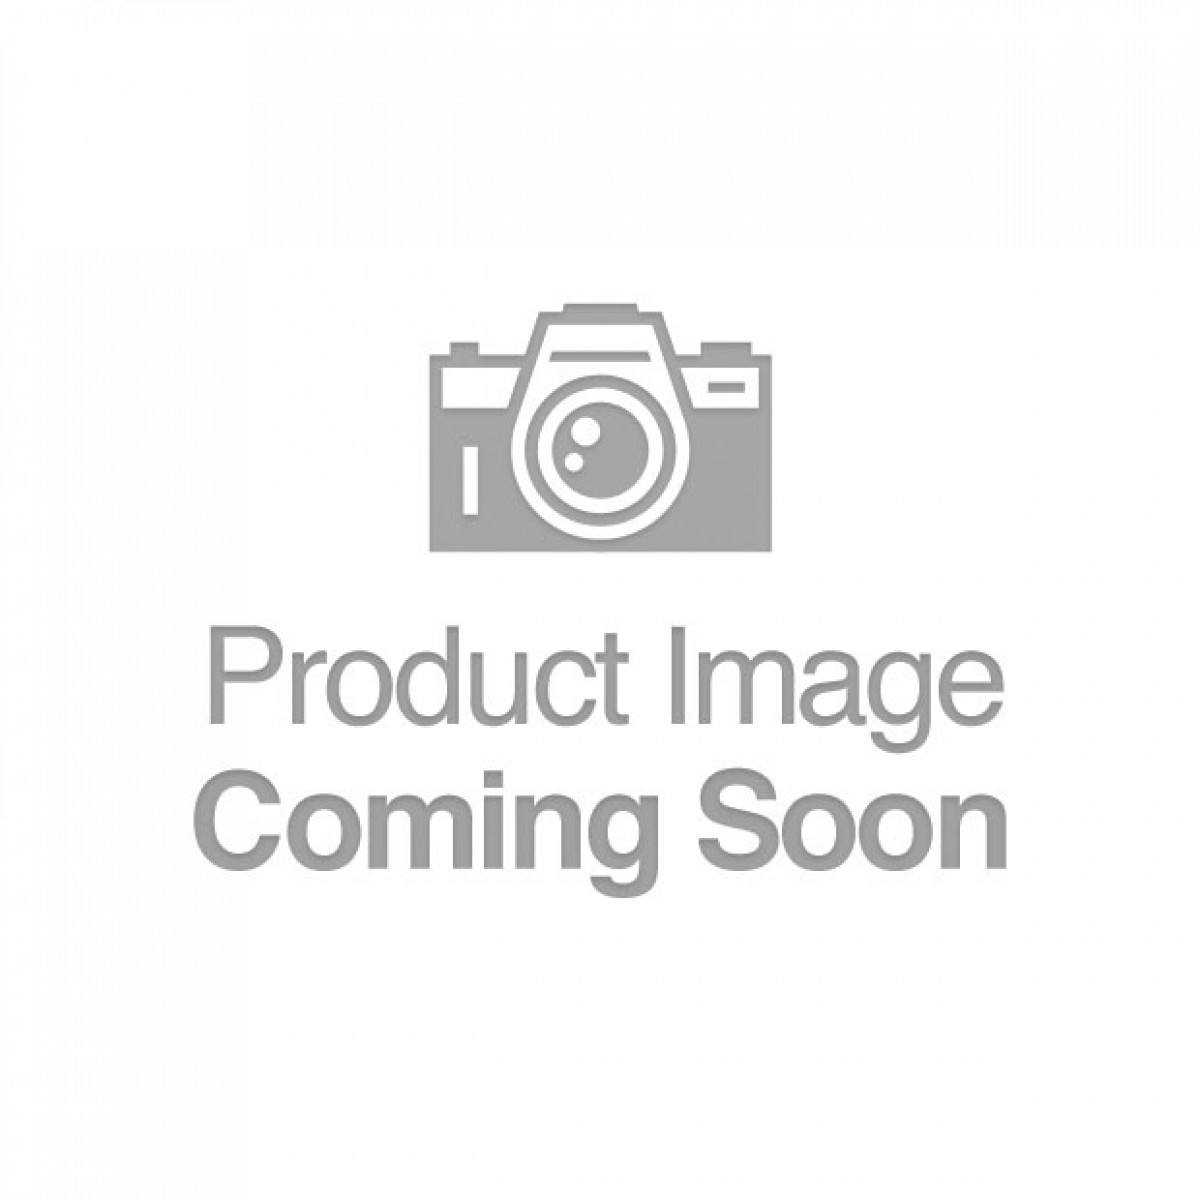 Fun Factory Stronic Surf Wavy Vibrator - Black